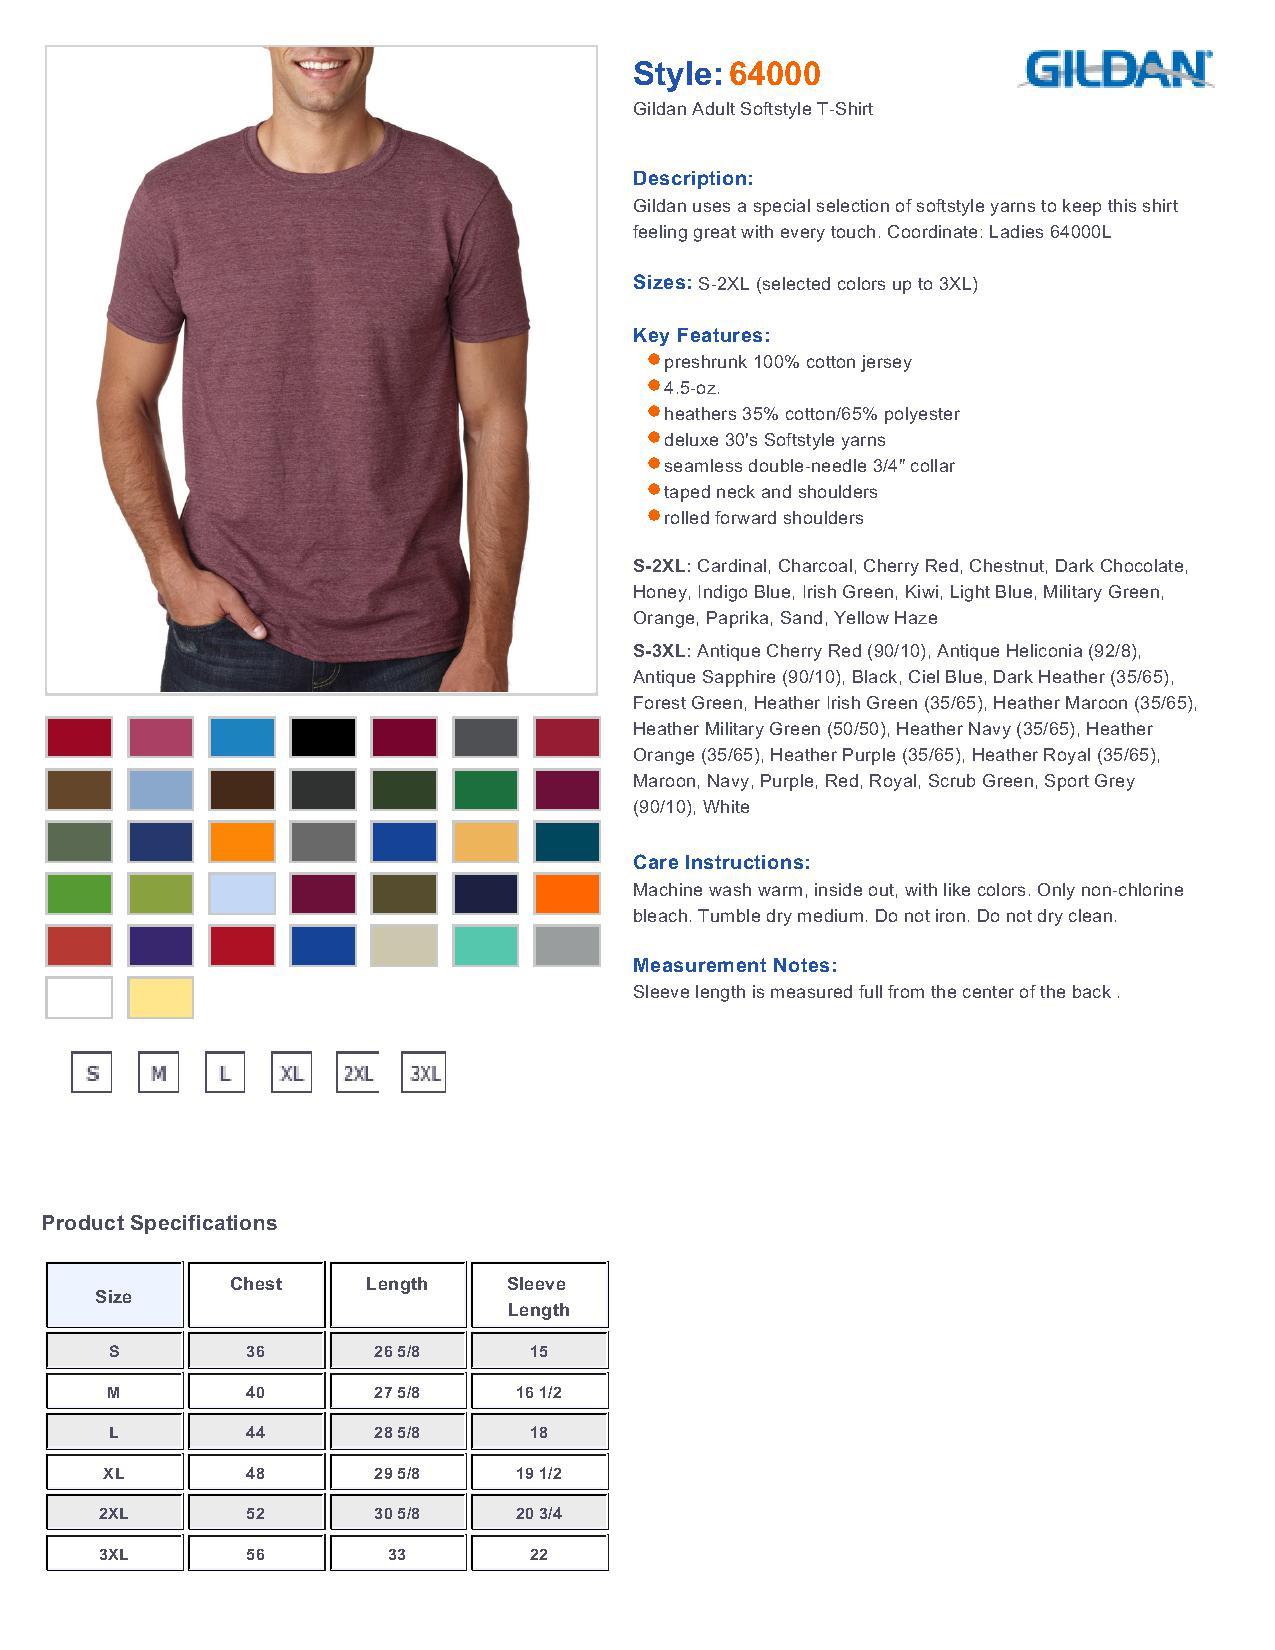 Gildan 64000 men 39 s softstyle t shirt men 39 s t shirts for Gildan t shirt size chart